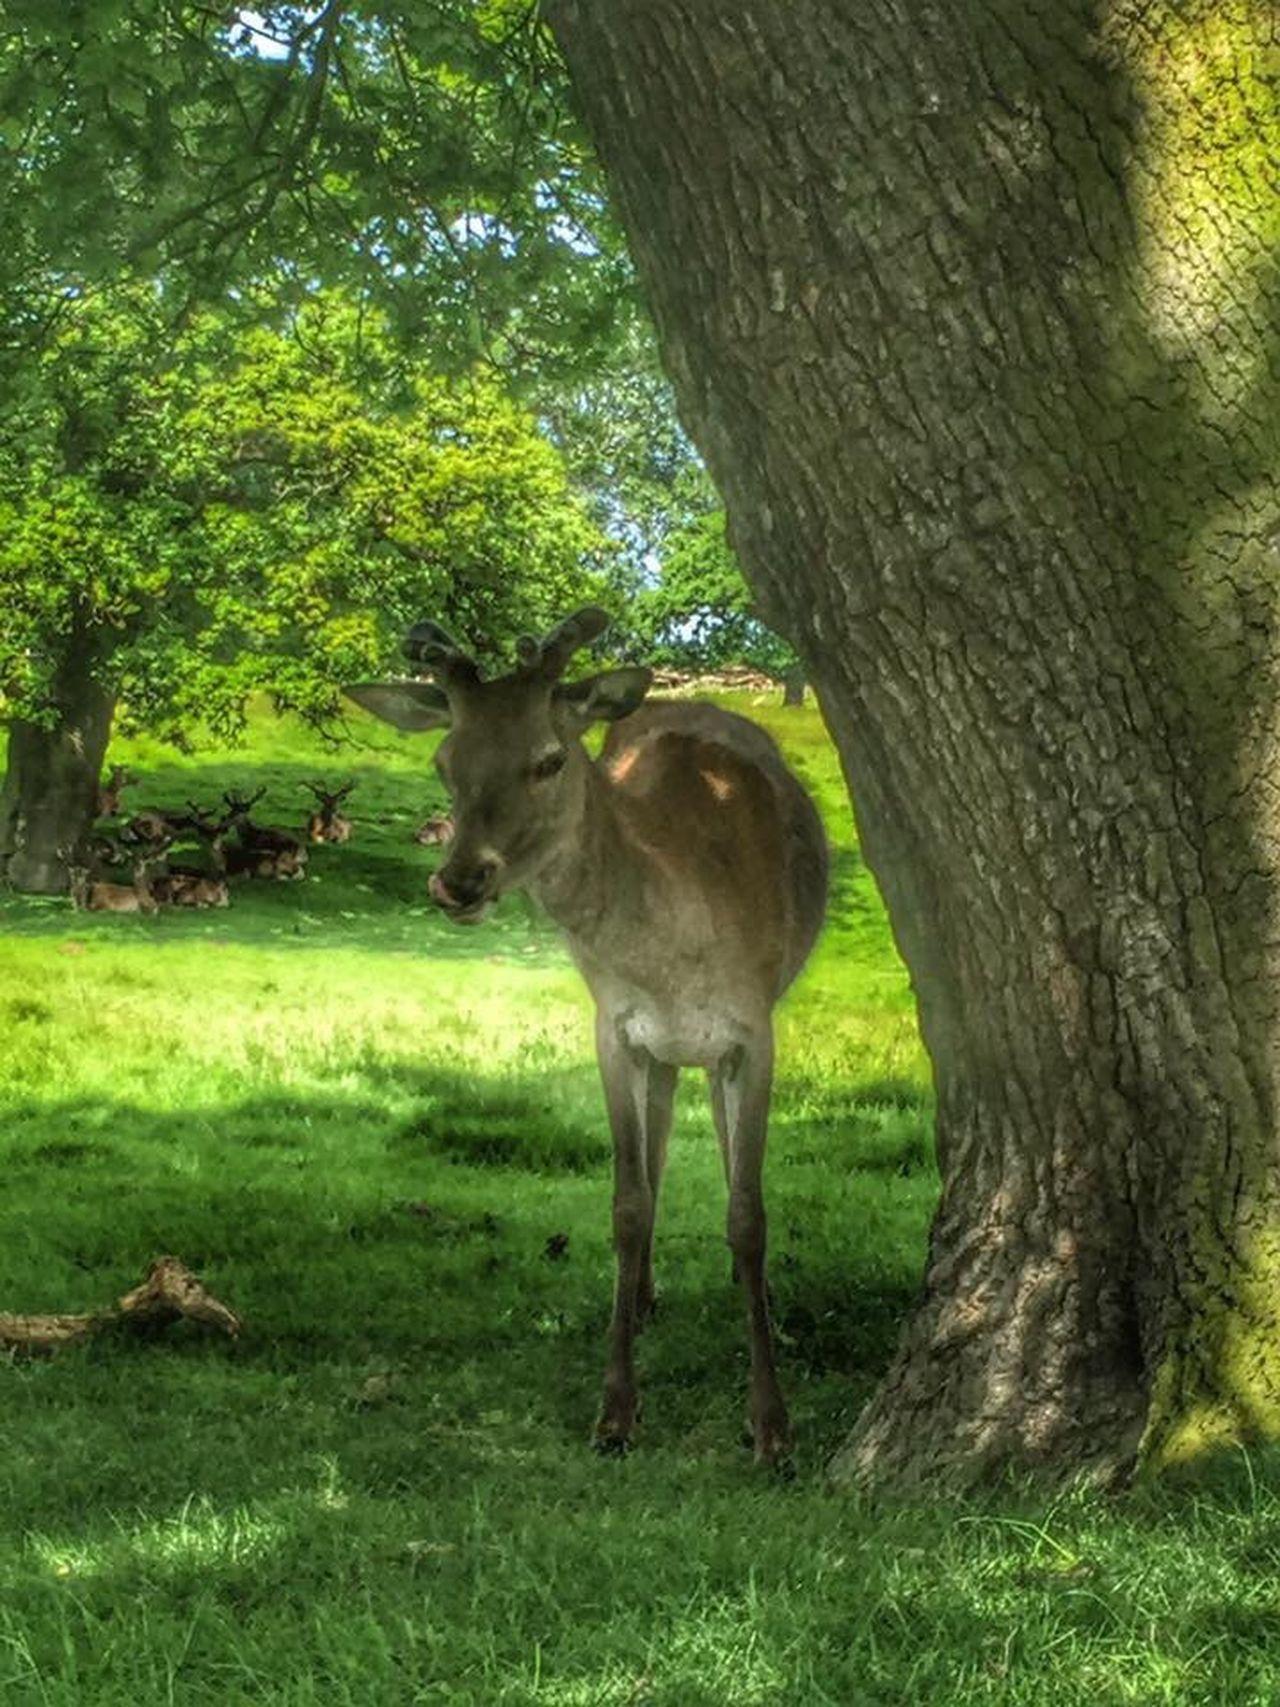 Deer Friendly Animals Nature On Your Doorstep Animals Castle Grounds Nature Landscape Deers Animals Close Up Deer Park